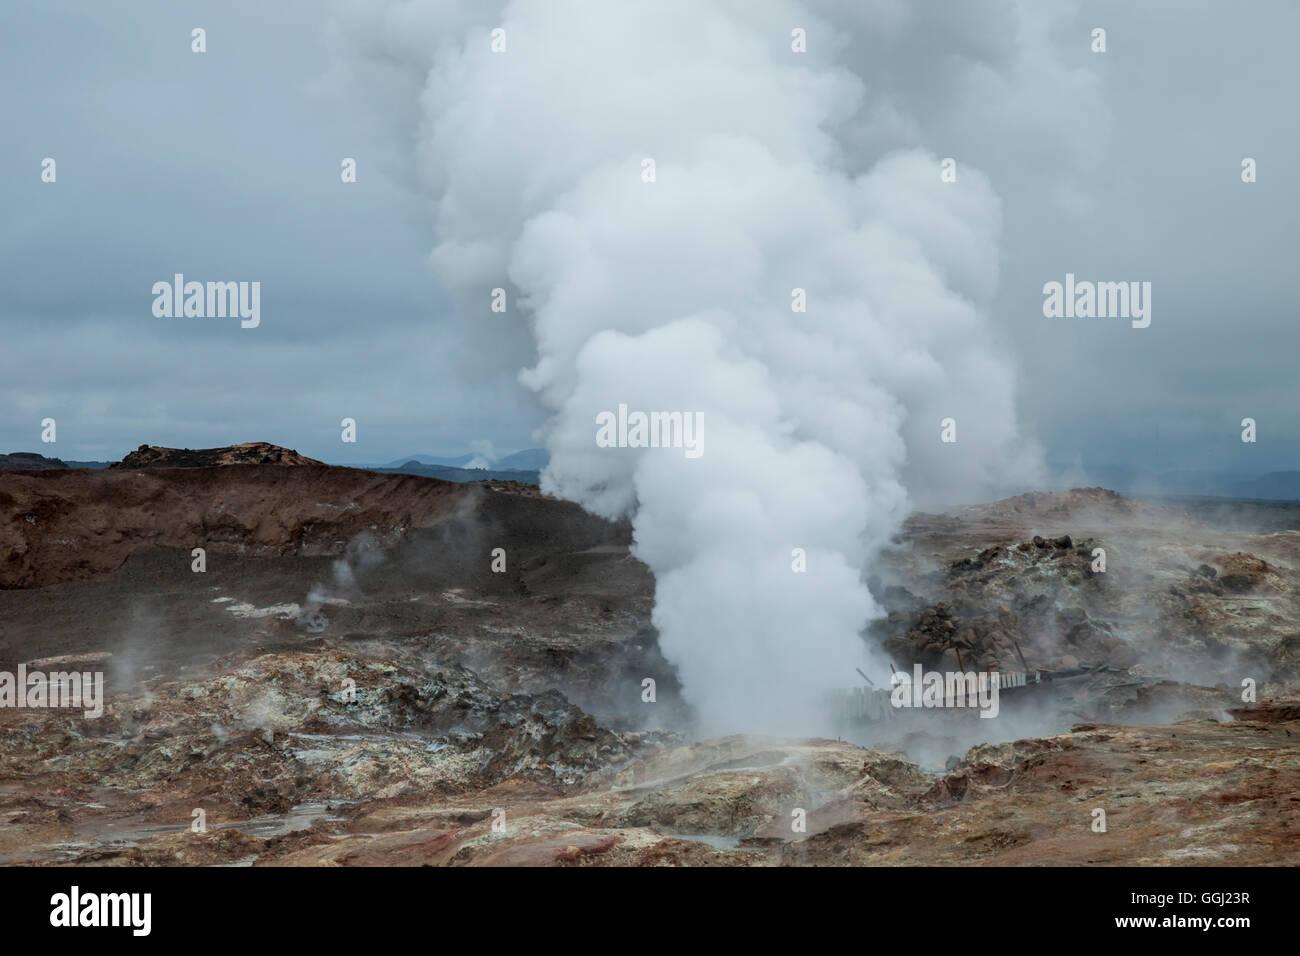 Steaming geysers near Keflavik, Iceland. - Stock Image